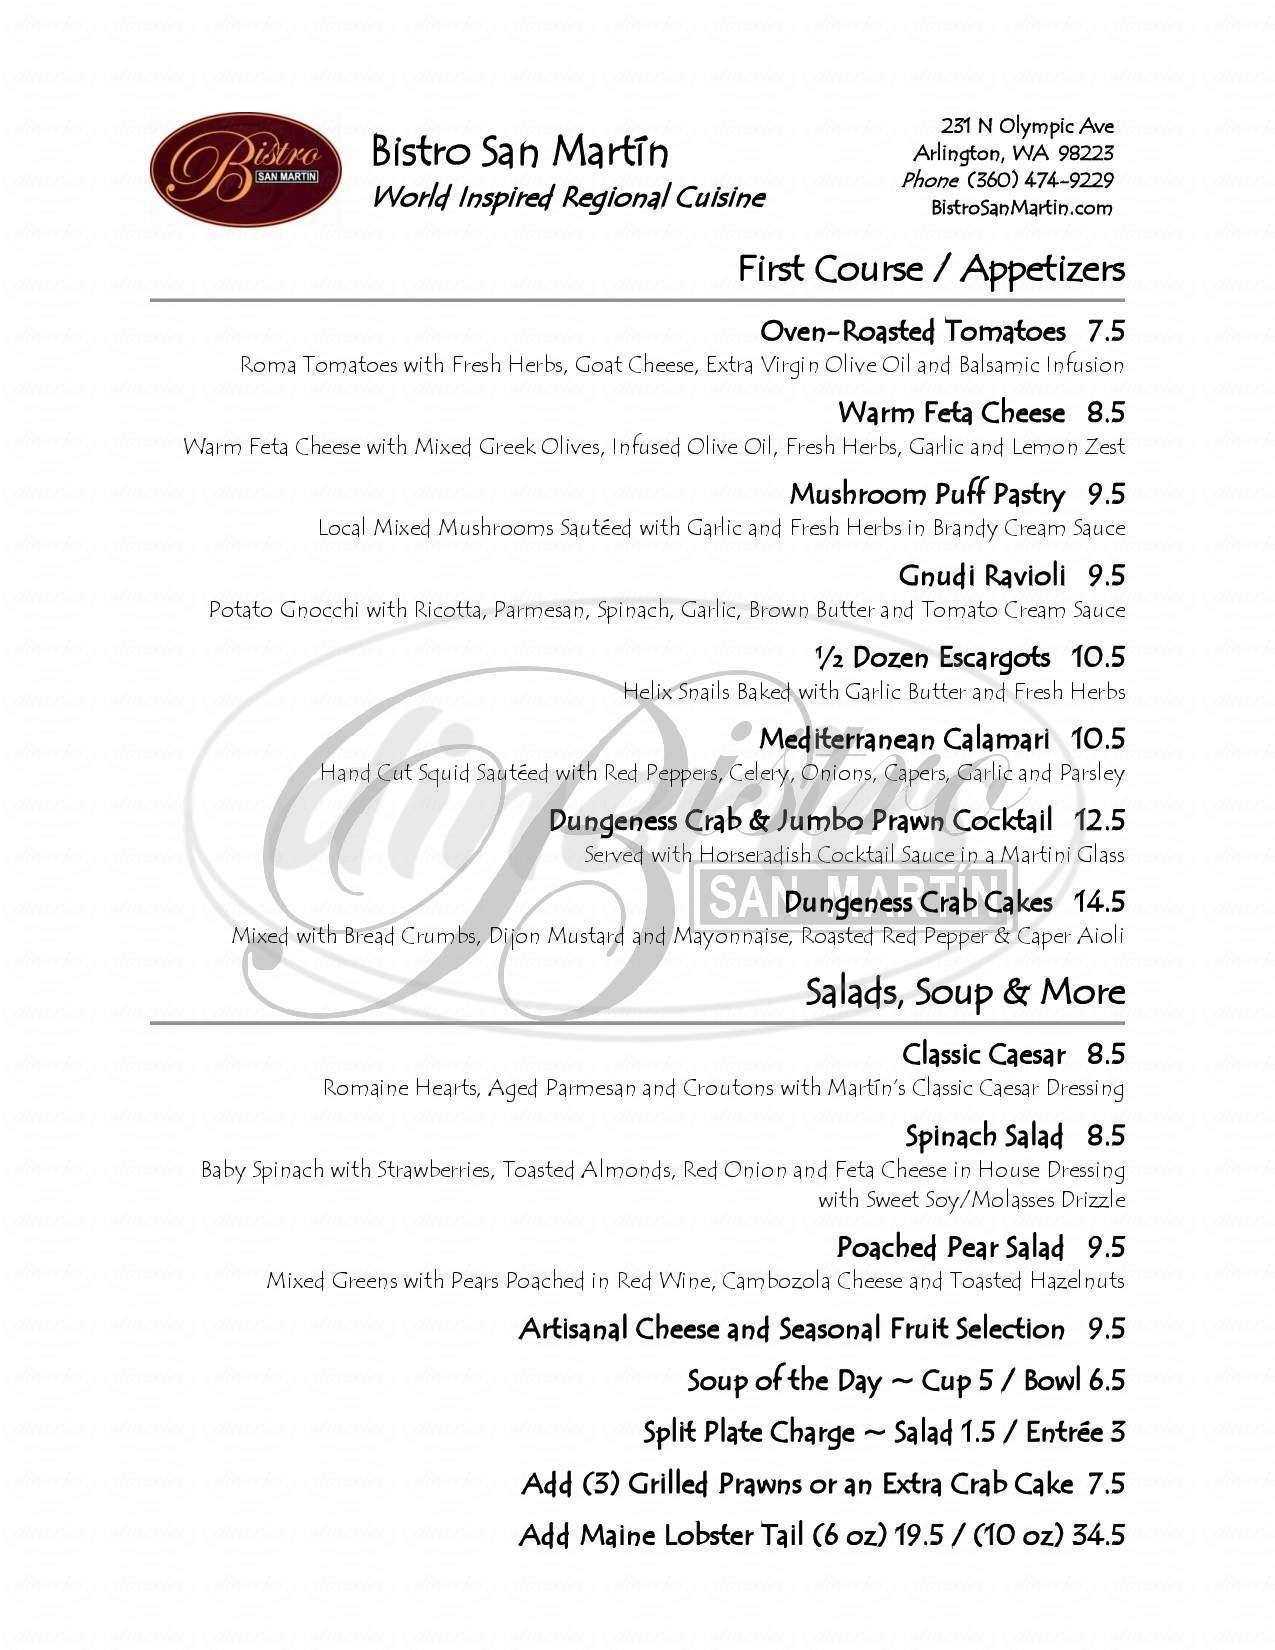 menu for Bistro San Martin